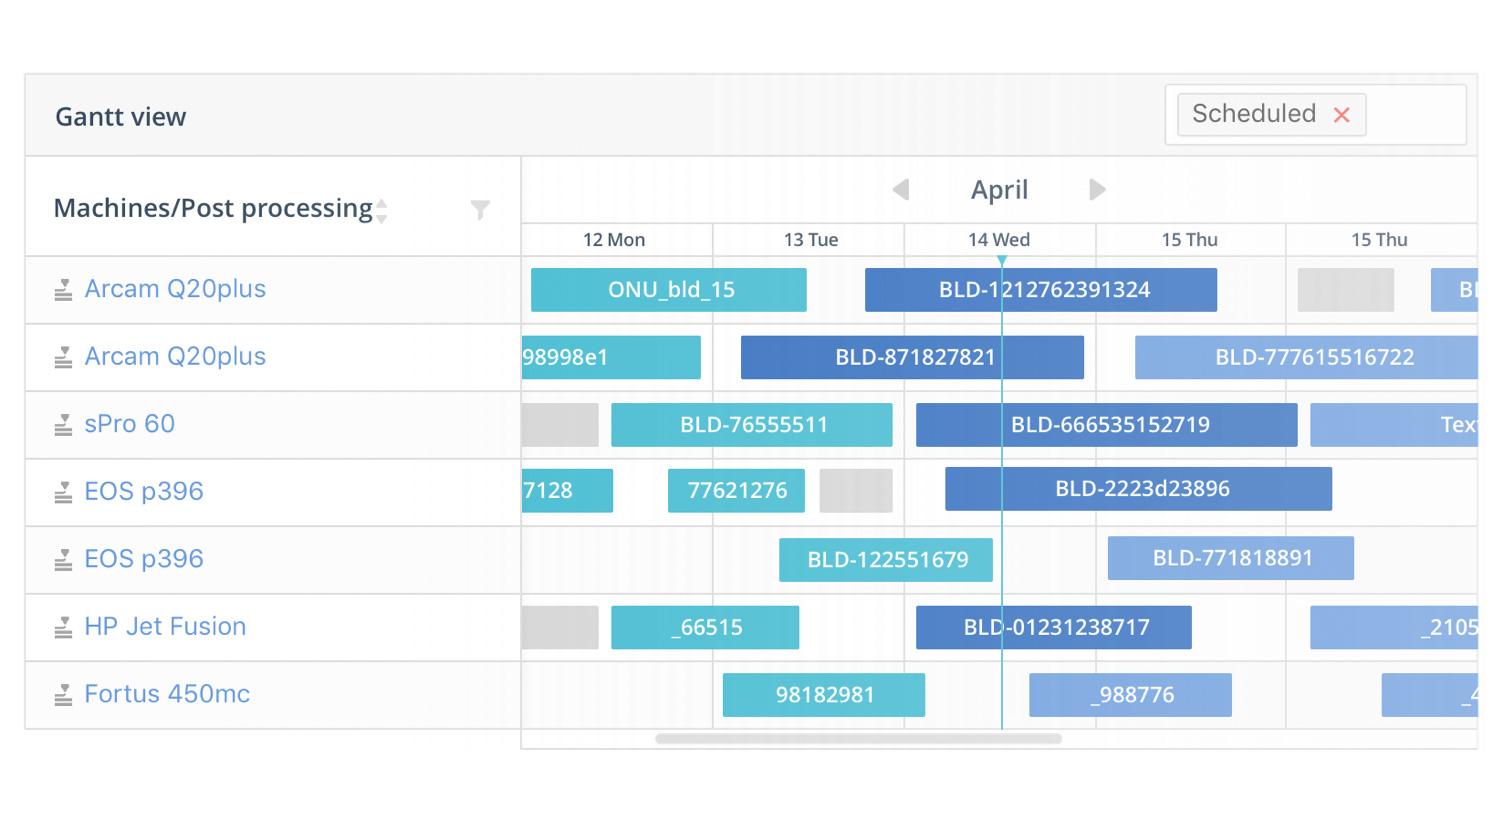 AMFG Production Scheduling. Image via AMFG.